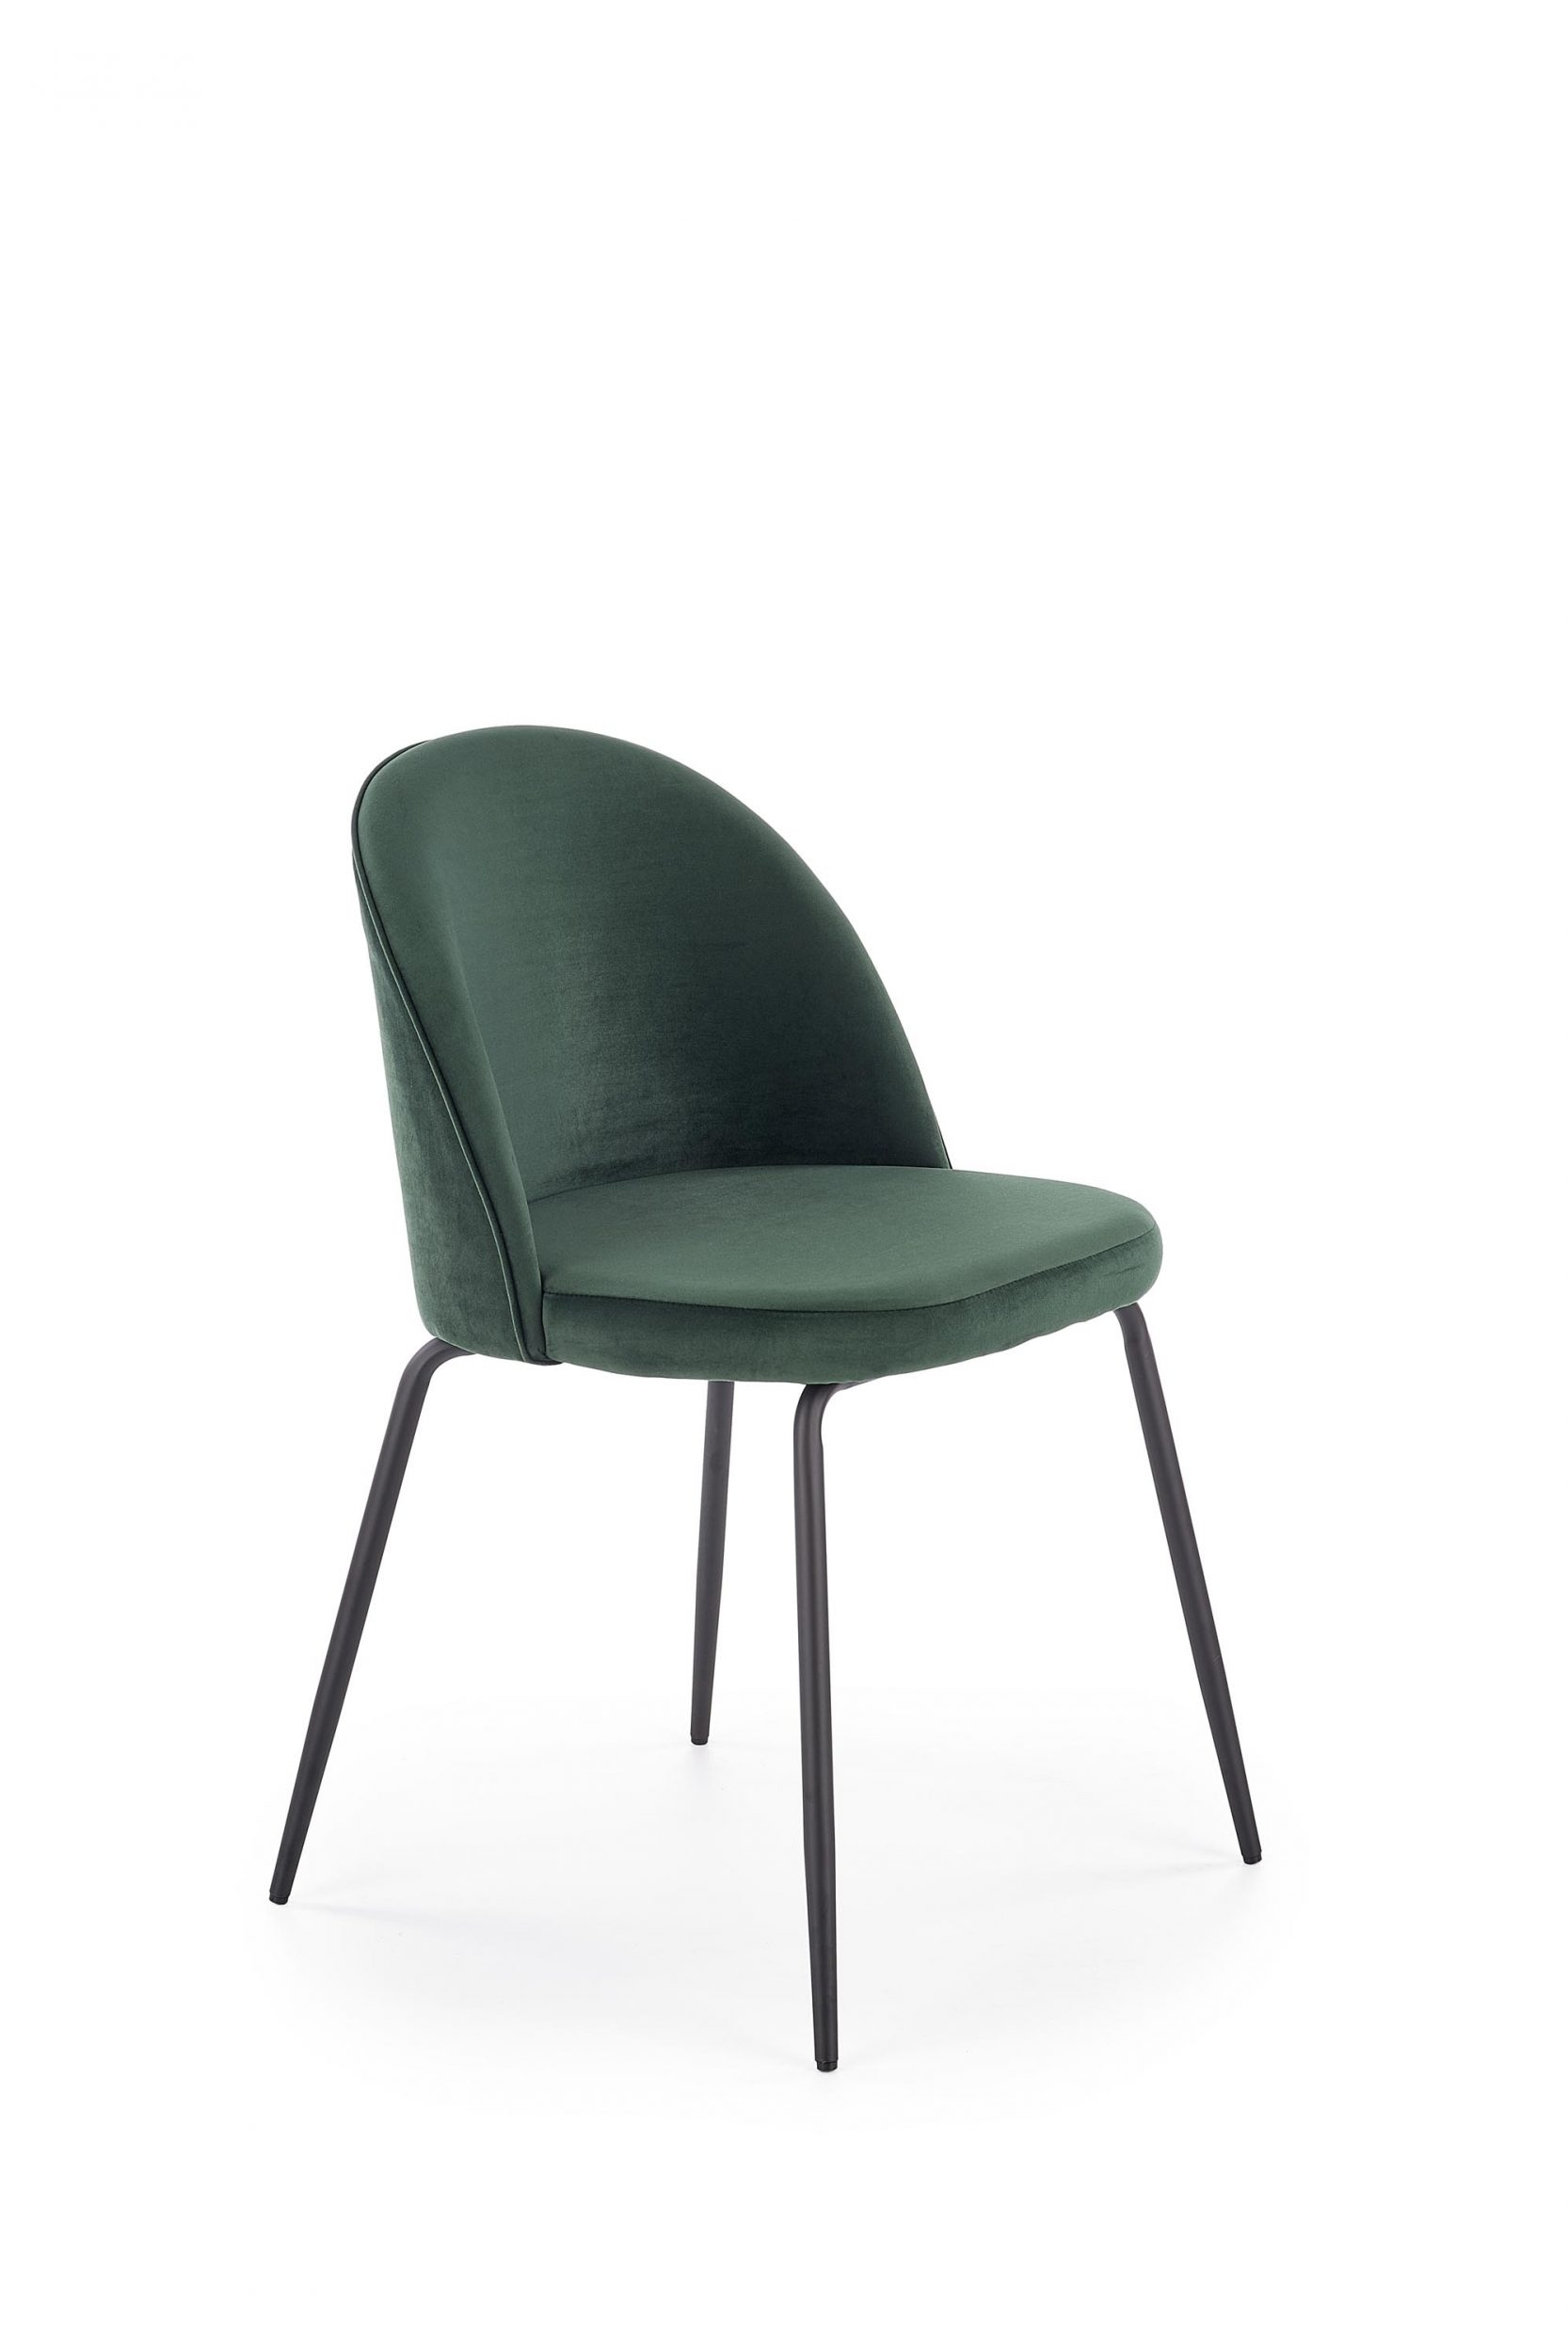 Scaun tapitat cu stofa cu picioare metalice K314 Verde inchis / Negru l49xA50xH80 cm